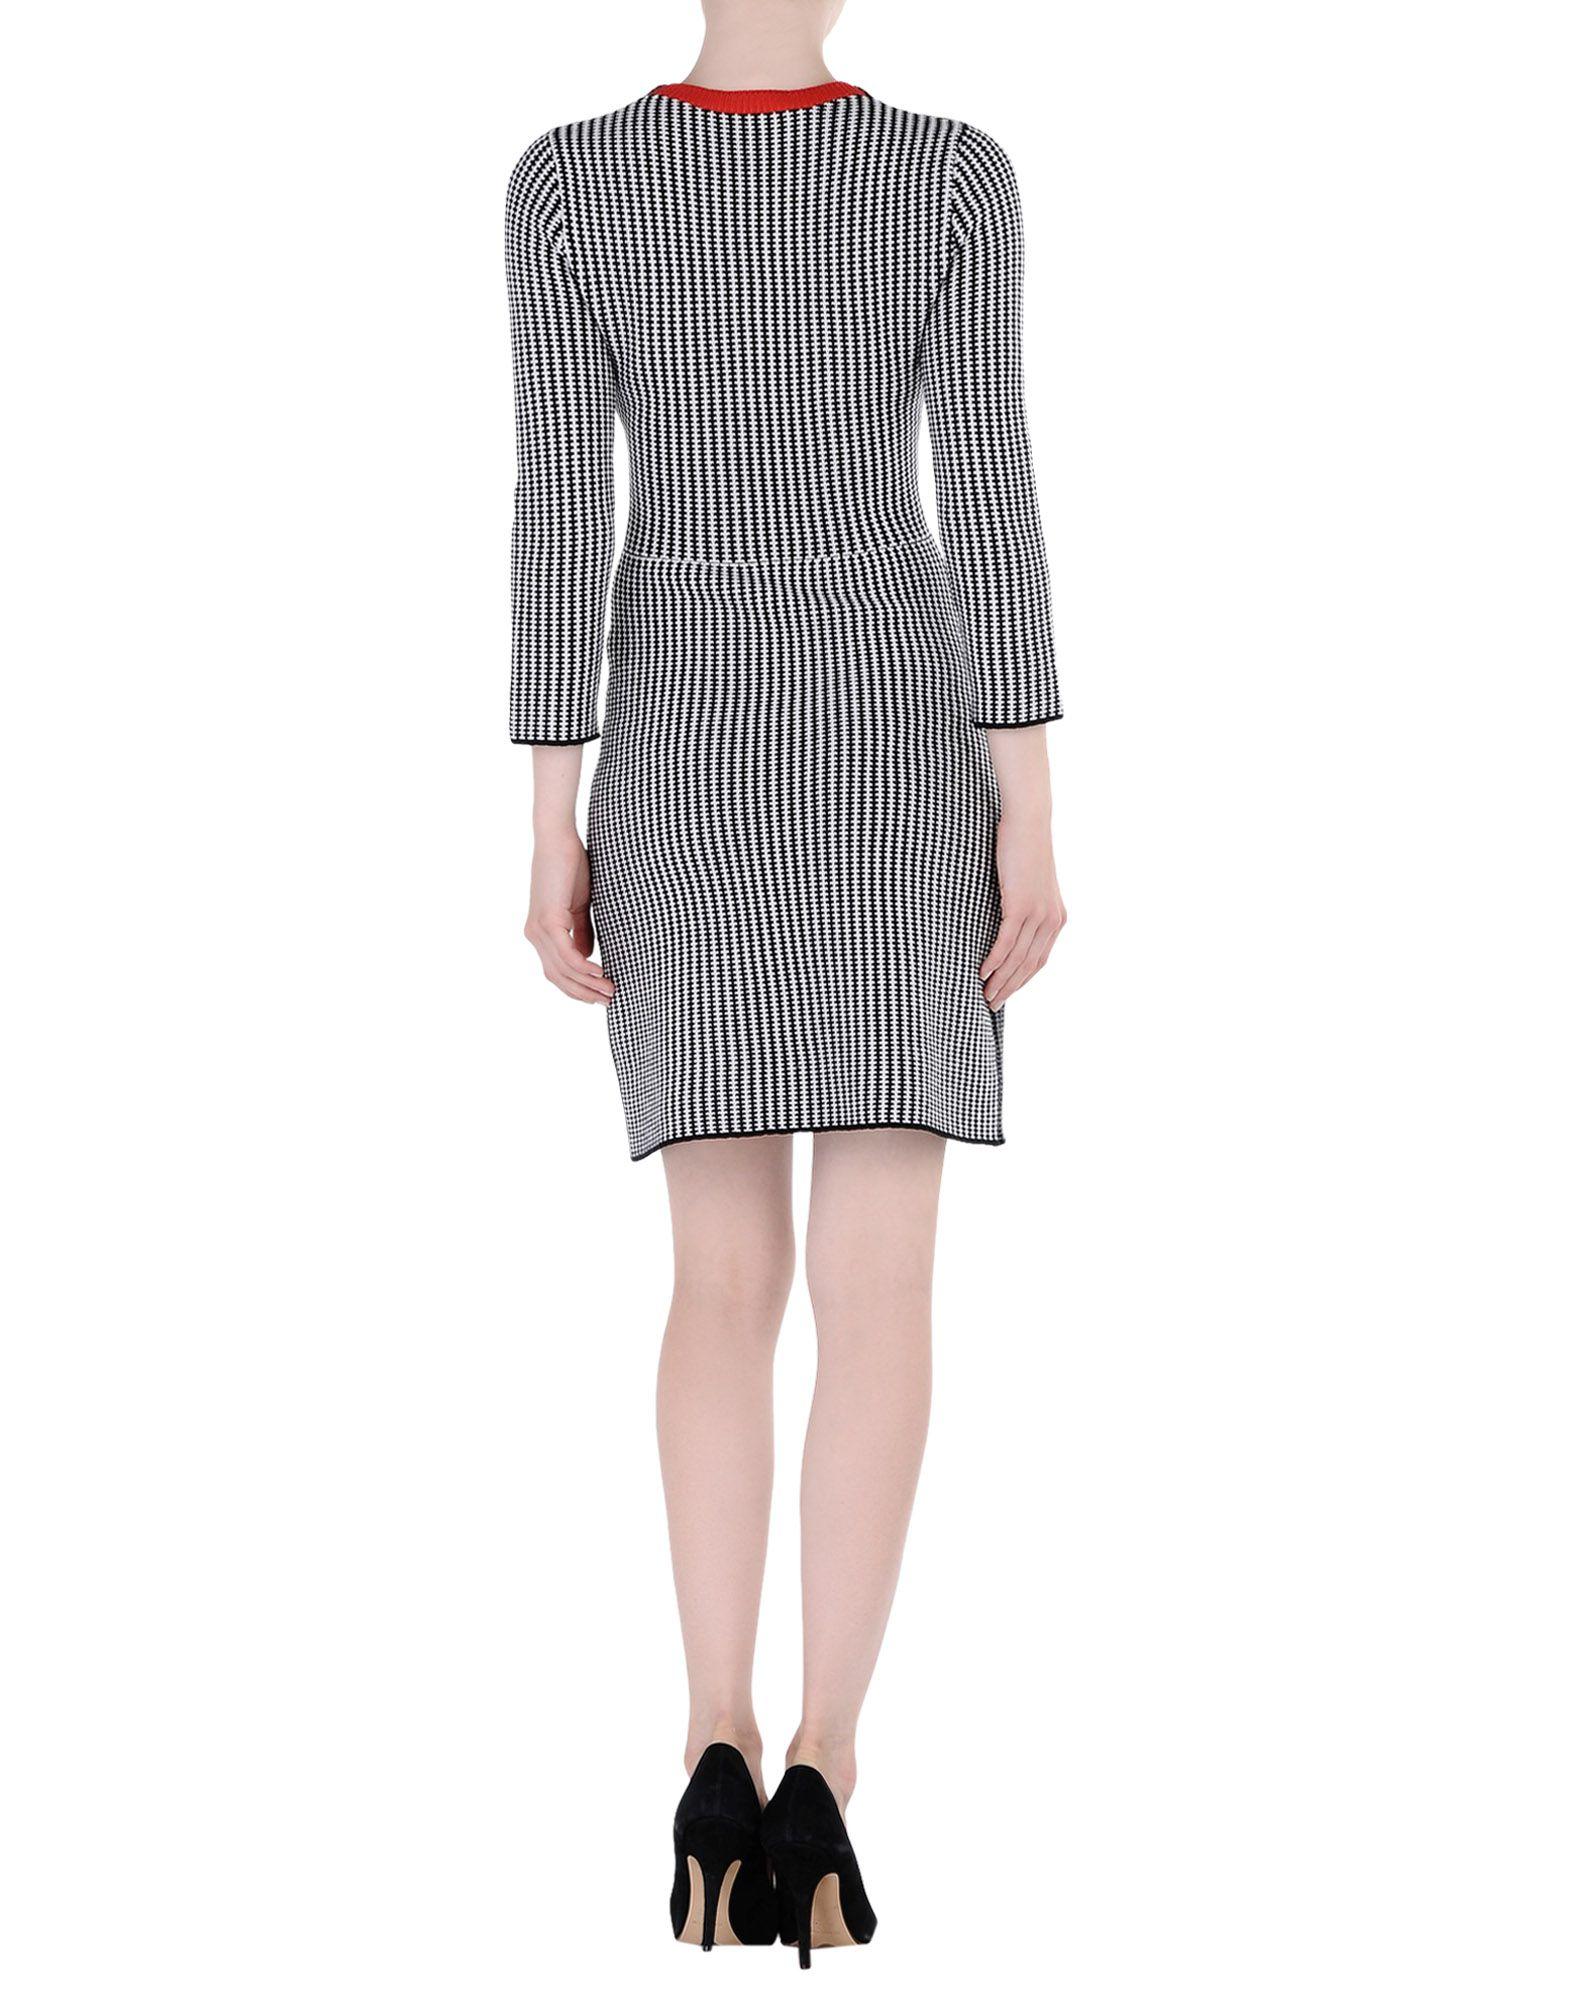 dior short dresses - photo #3